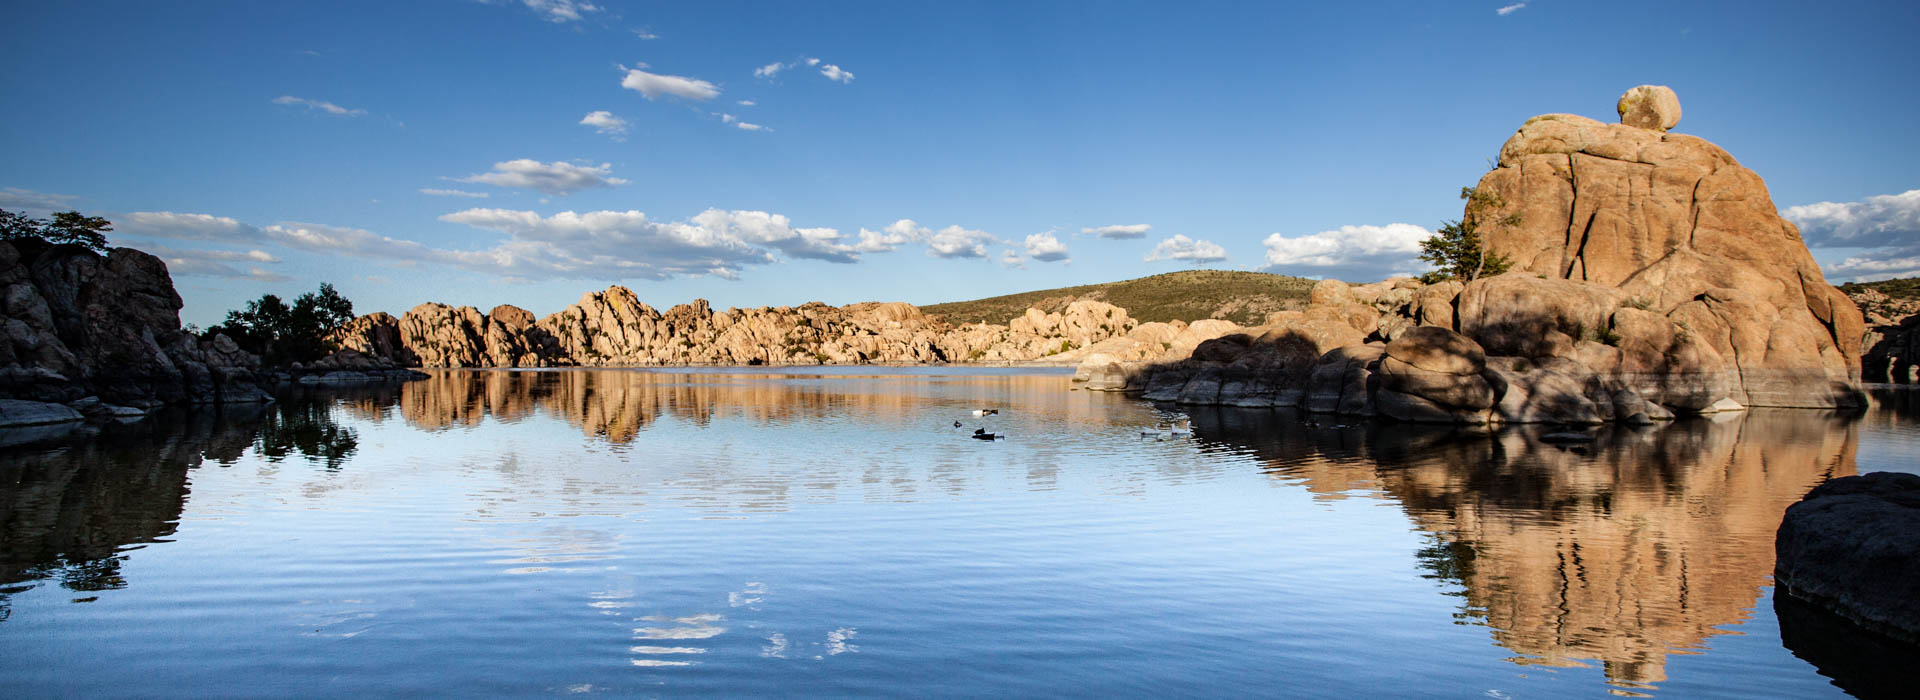 Watson Lake High Sun Prescott Arizona Photographer Richard Charpentier